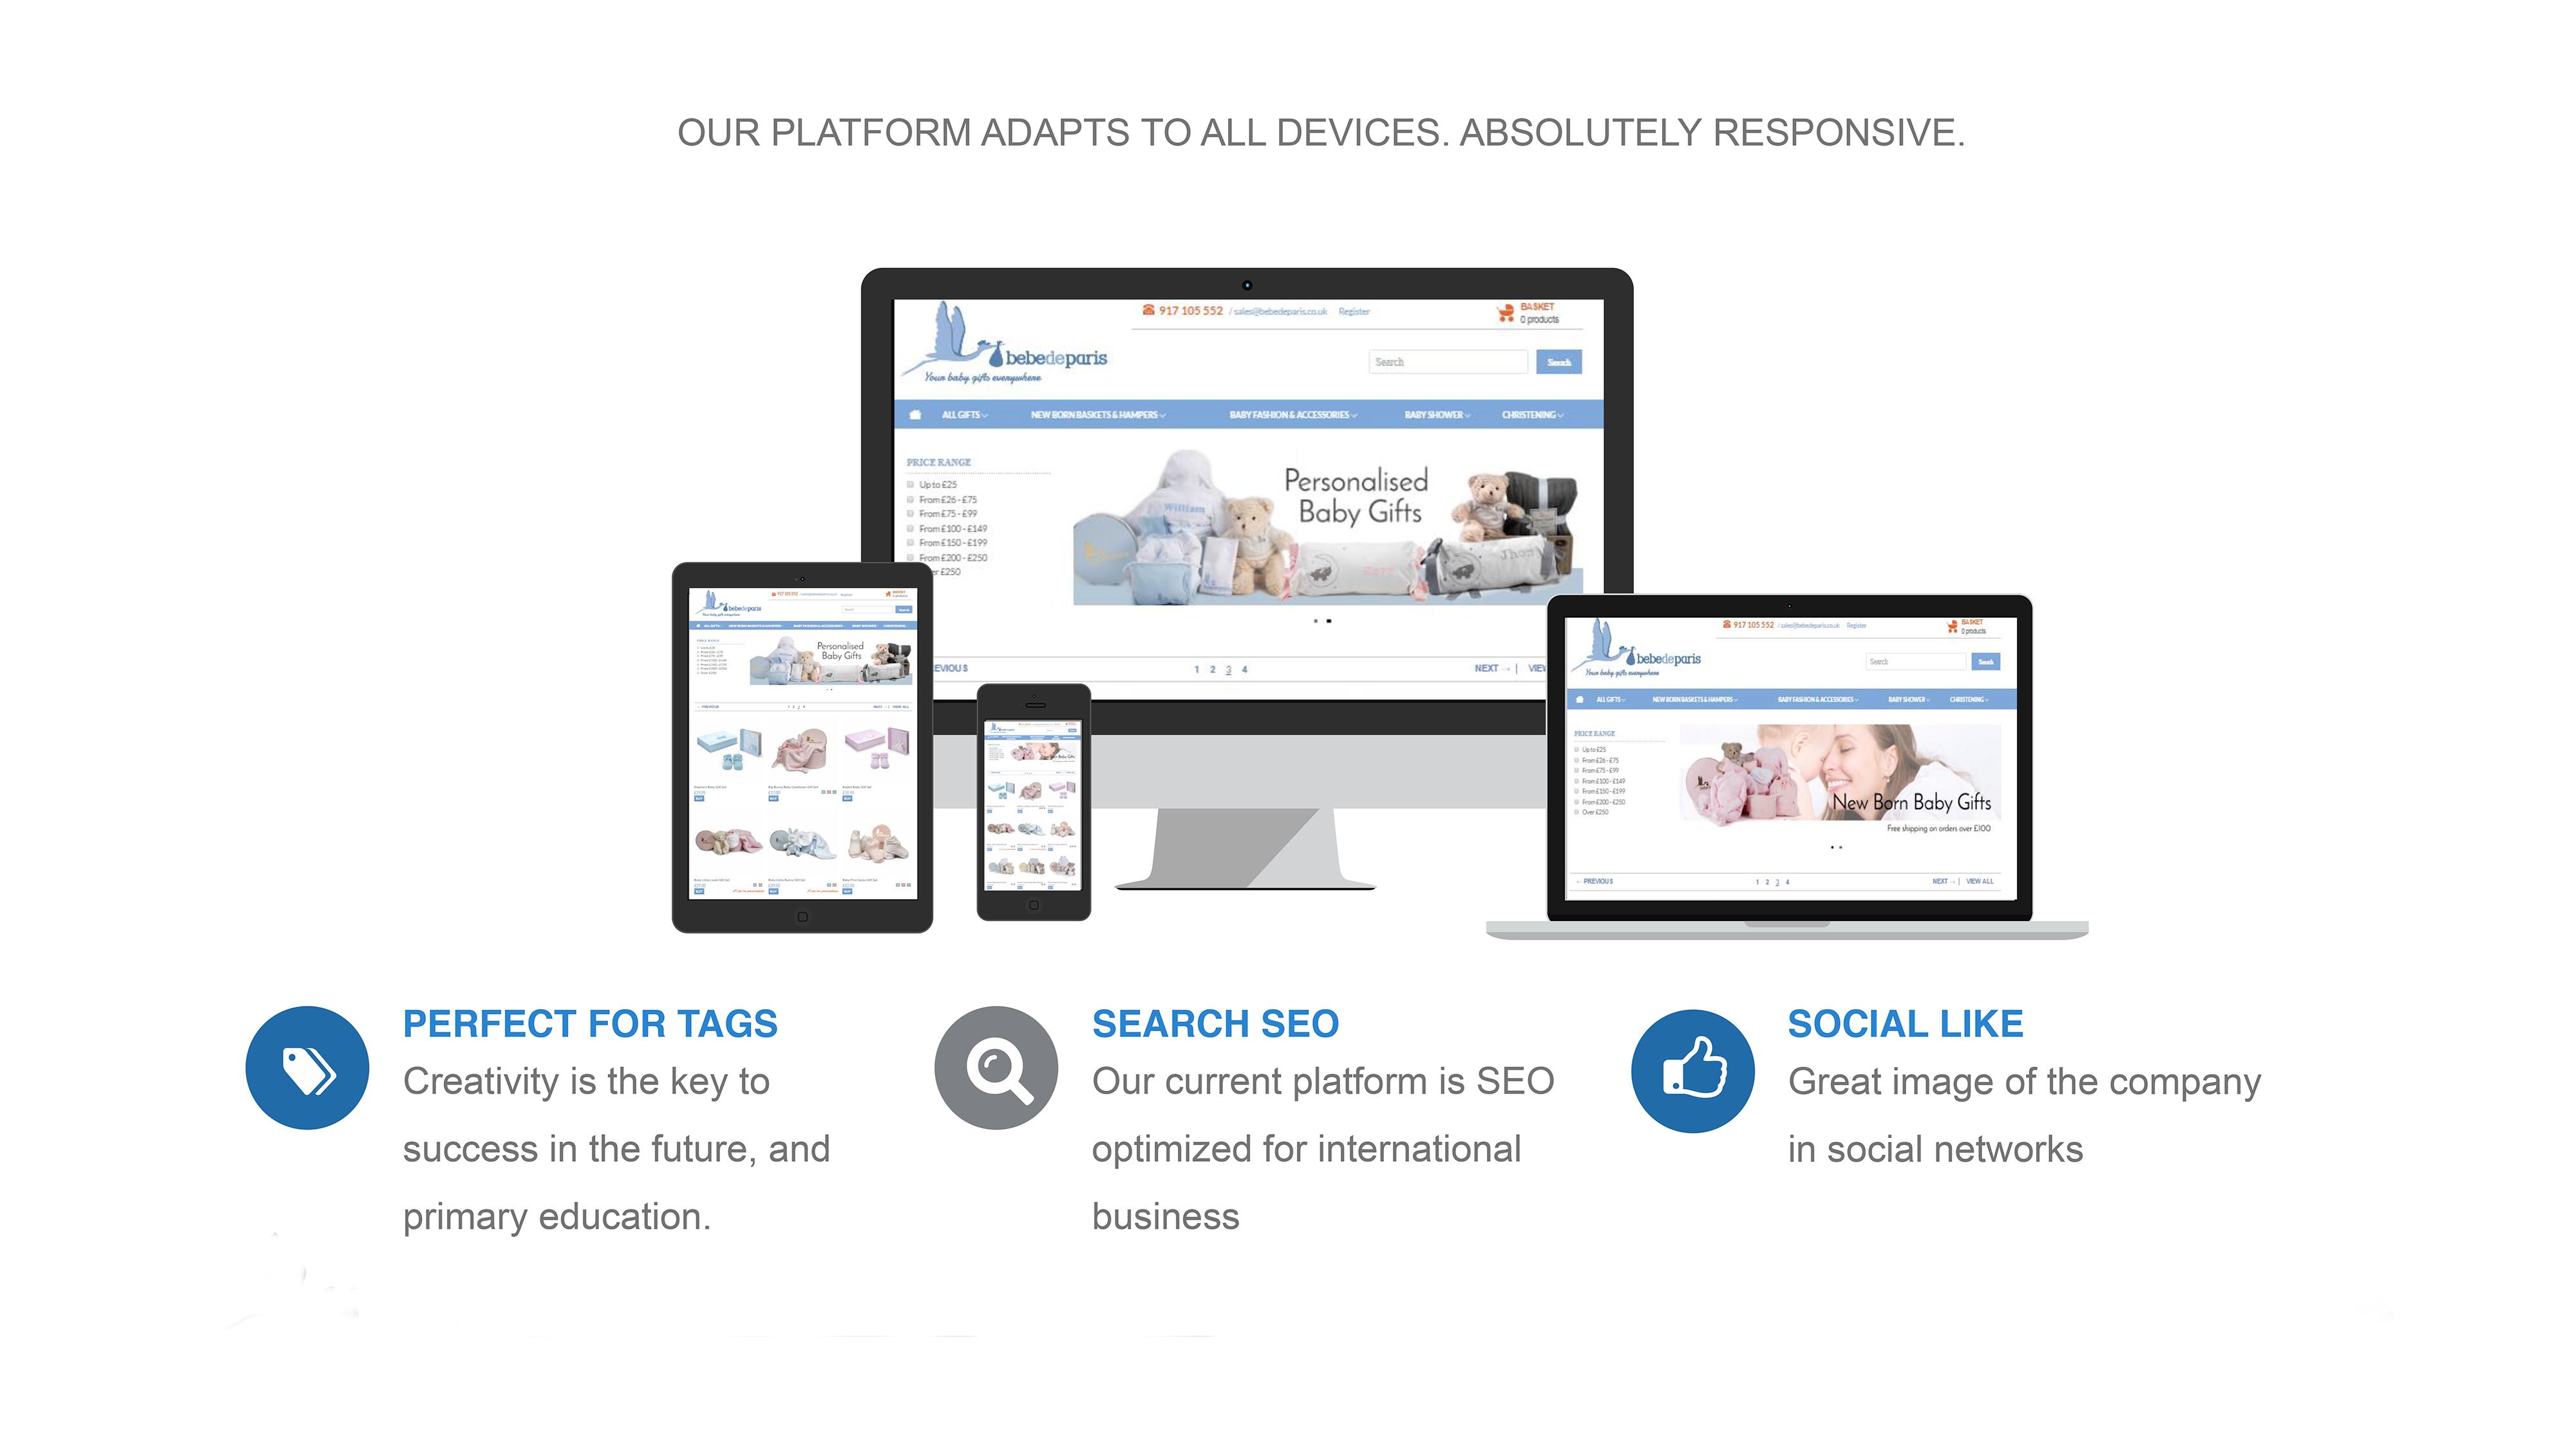 Our platform |BebedeParis